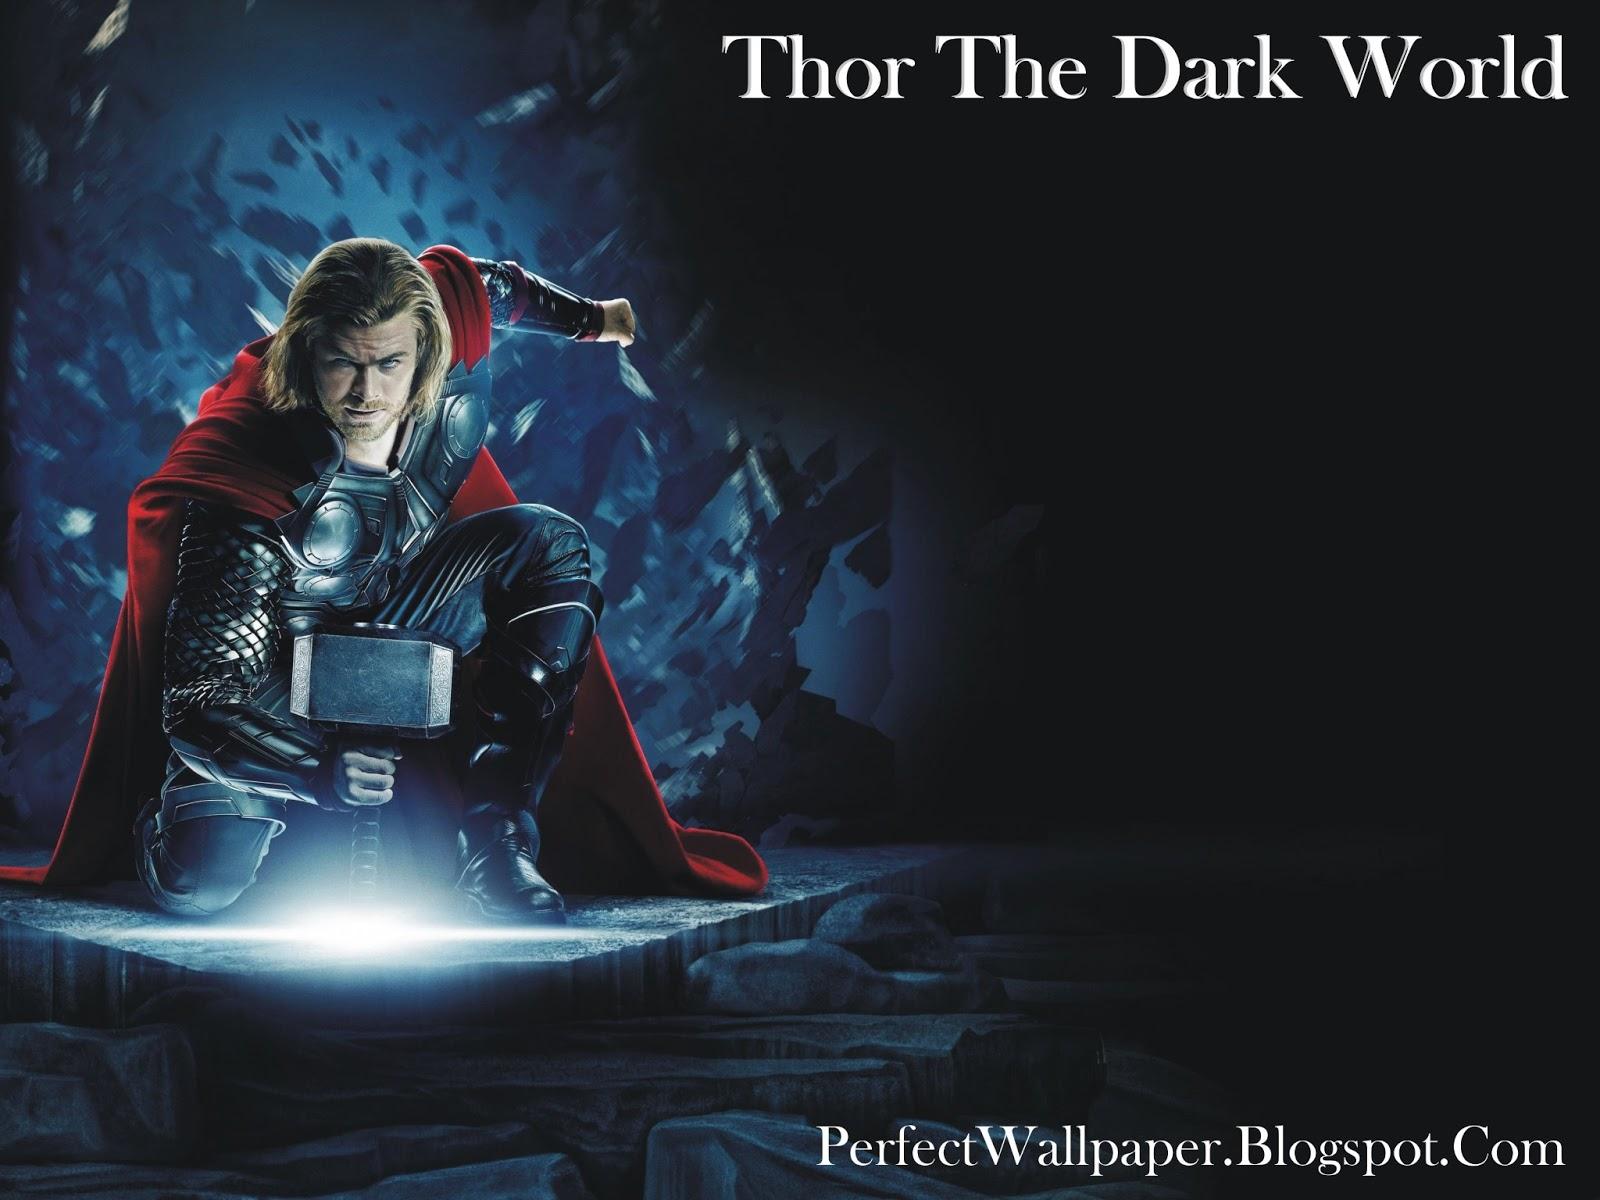 thor the dark world wallpaper - photo #12